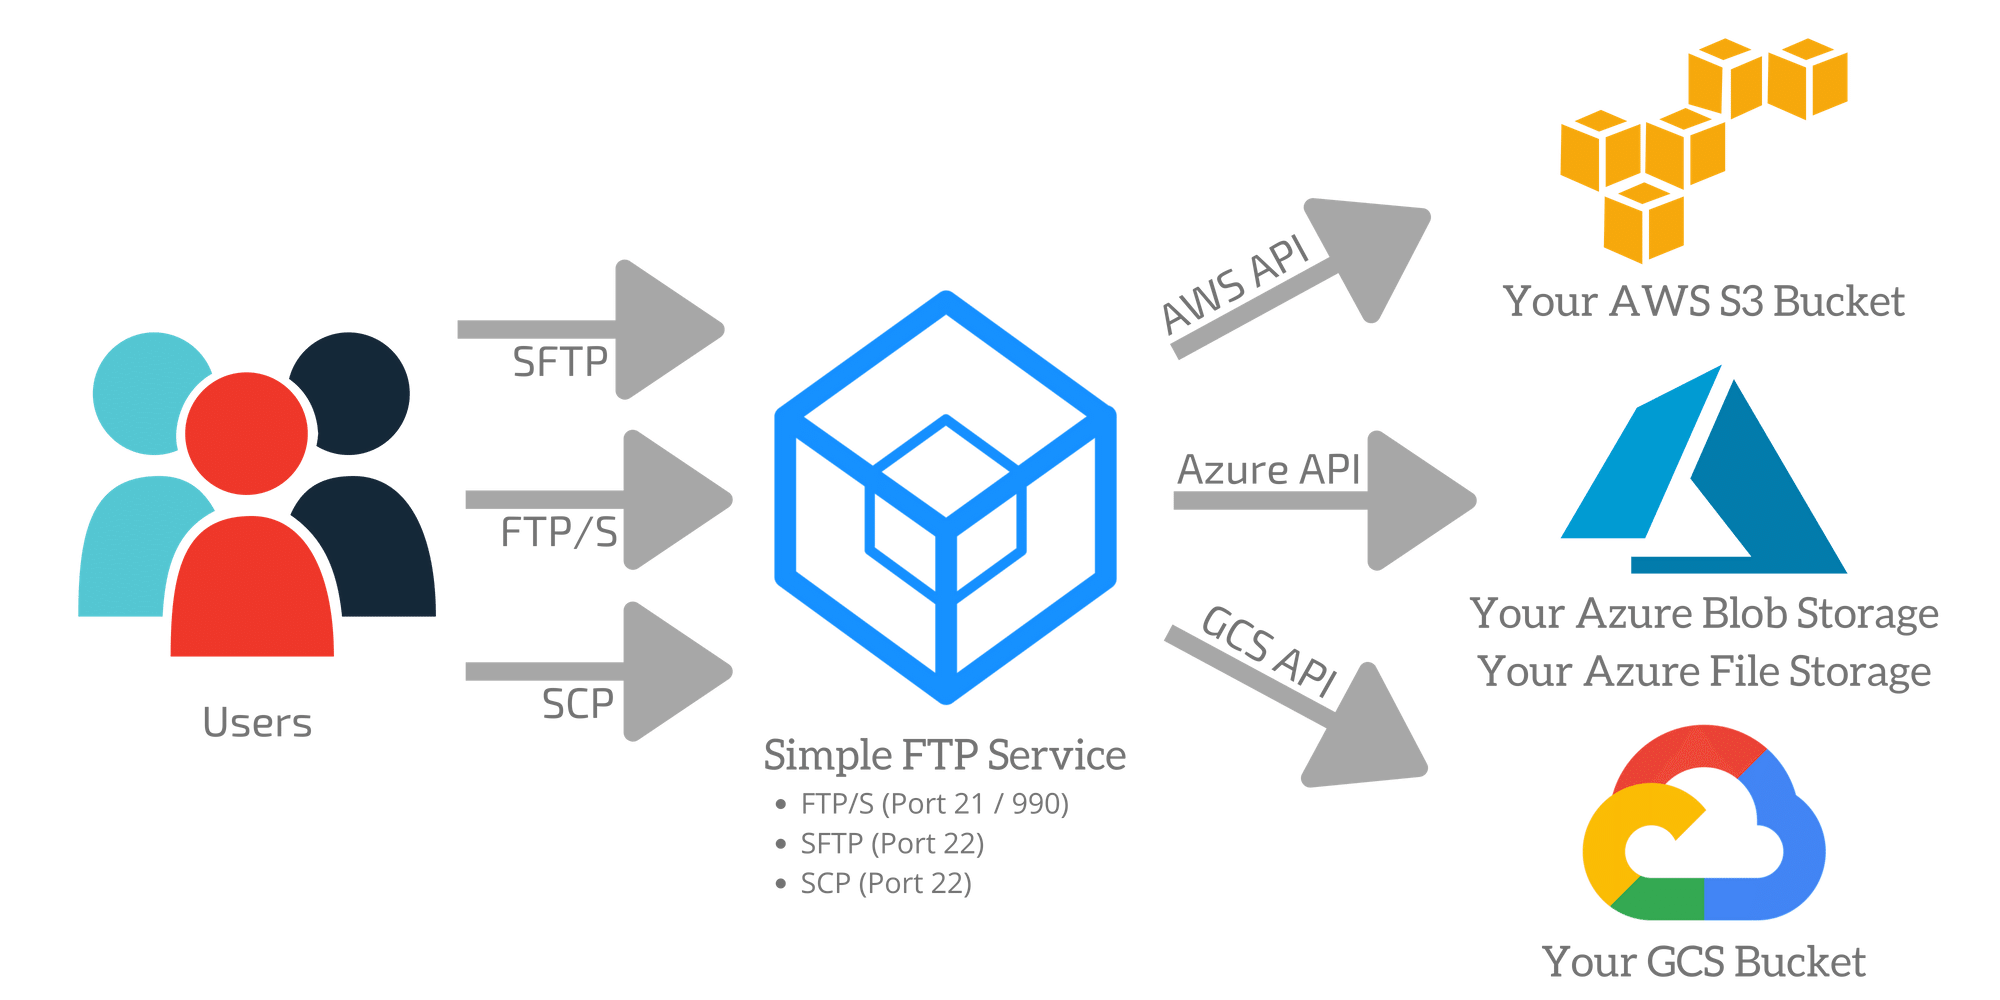 Simple FTP Service | DocEvent